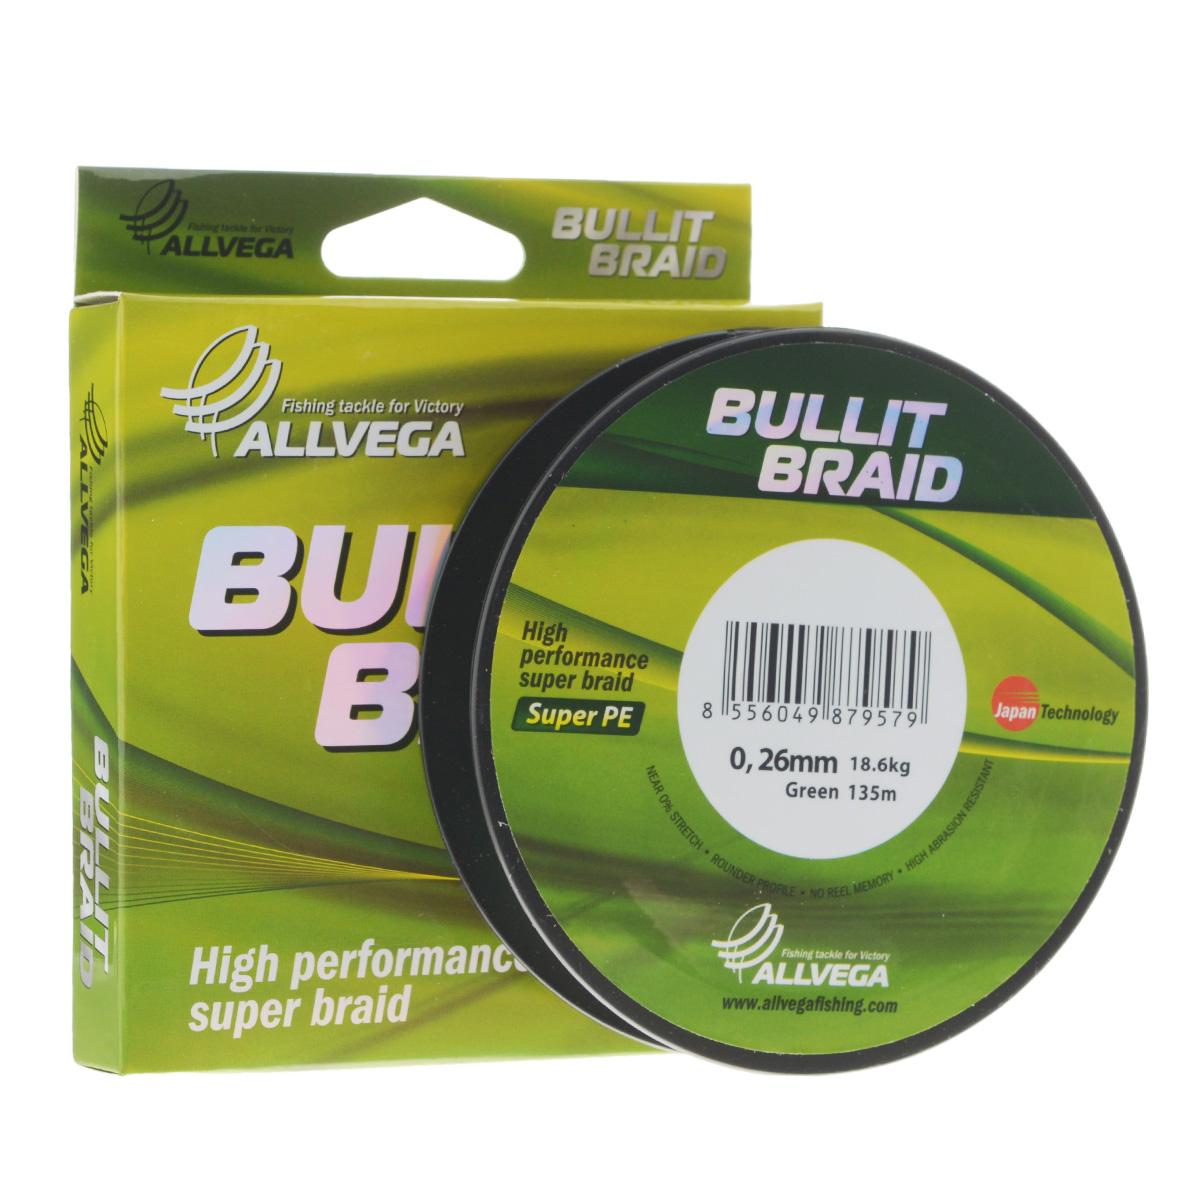 "Леска плетеная Allvega ""Bullit Braid"", цвет: темно-зеленый, 135 м, 0,26 мм, 18,6 кг 21446"